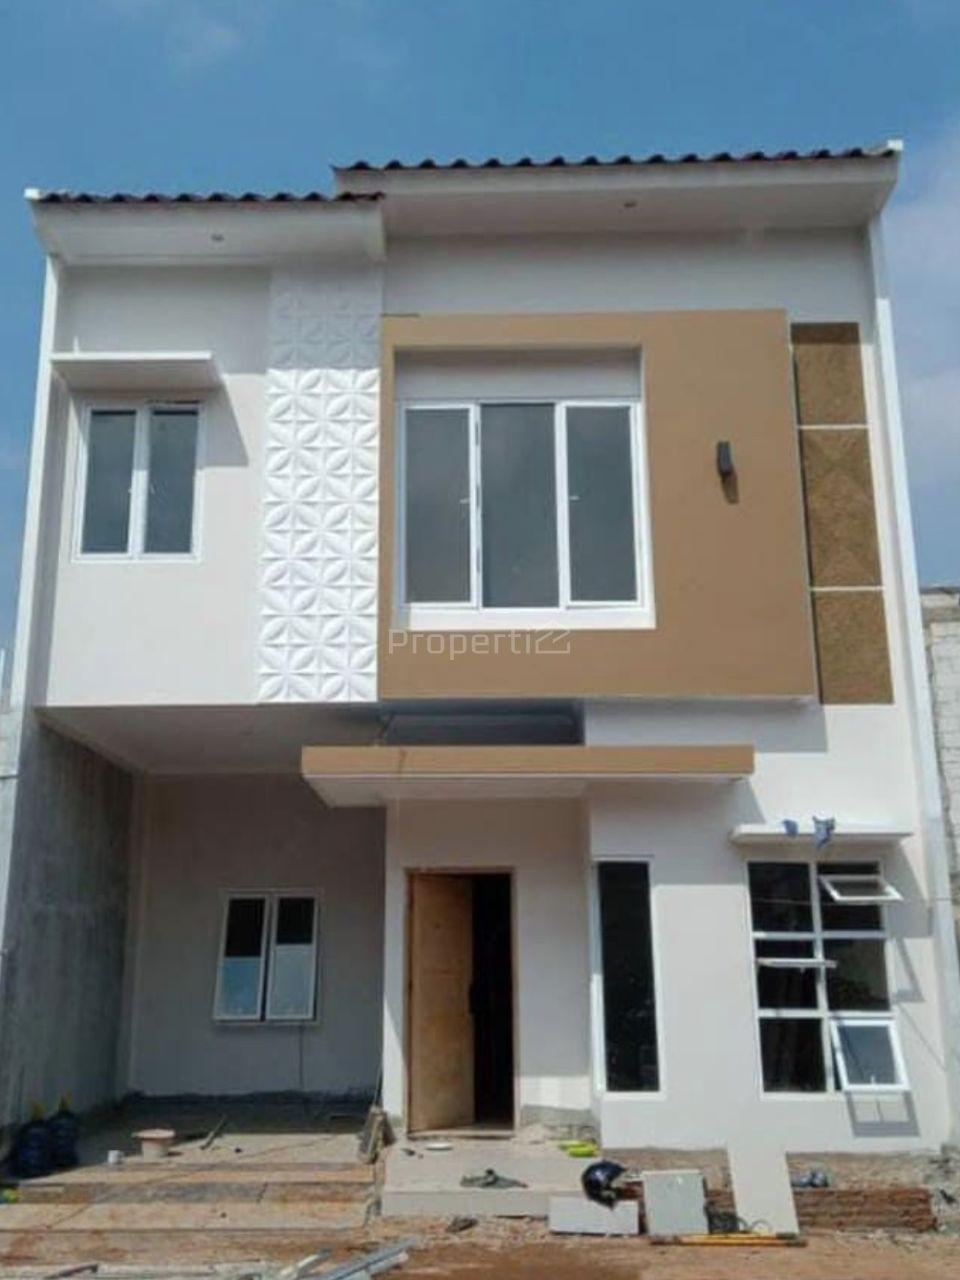 Rumah Baru di Ciganjur, Jakarta Selatan, DKI Jakarta